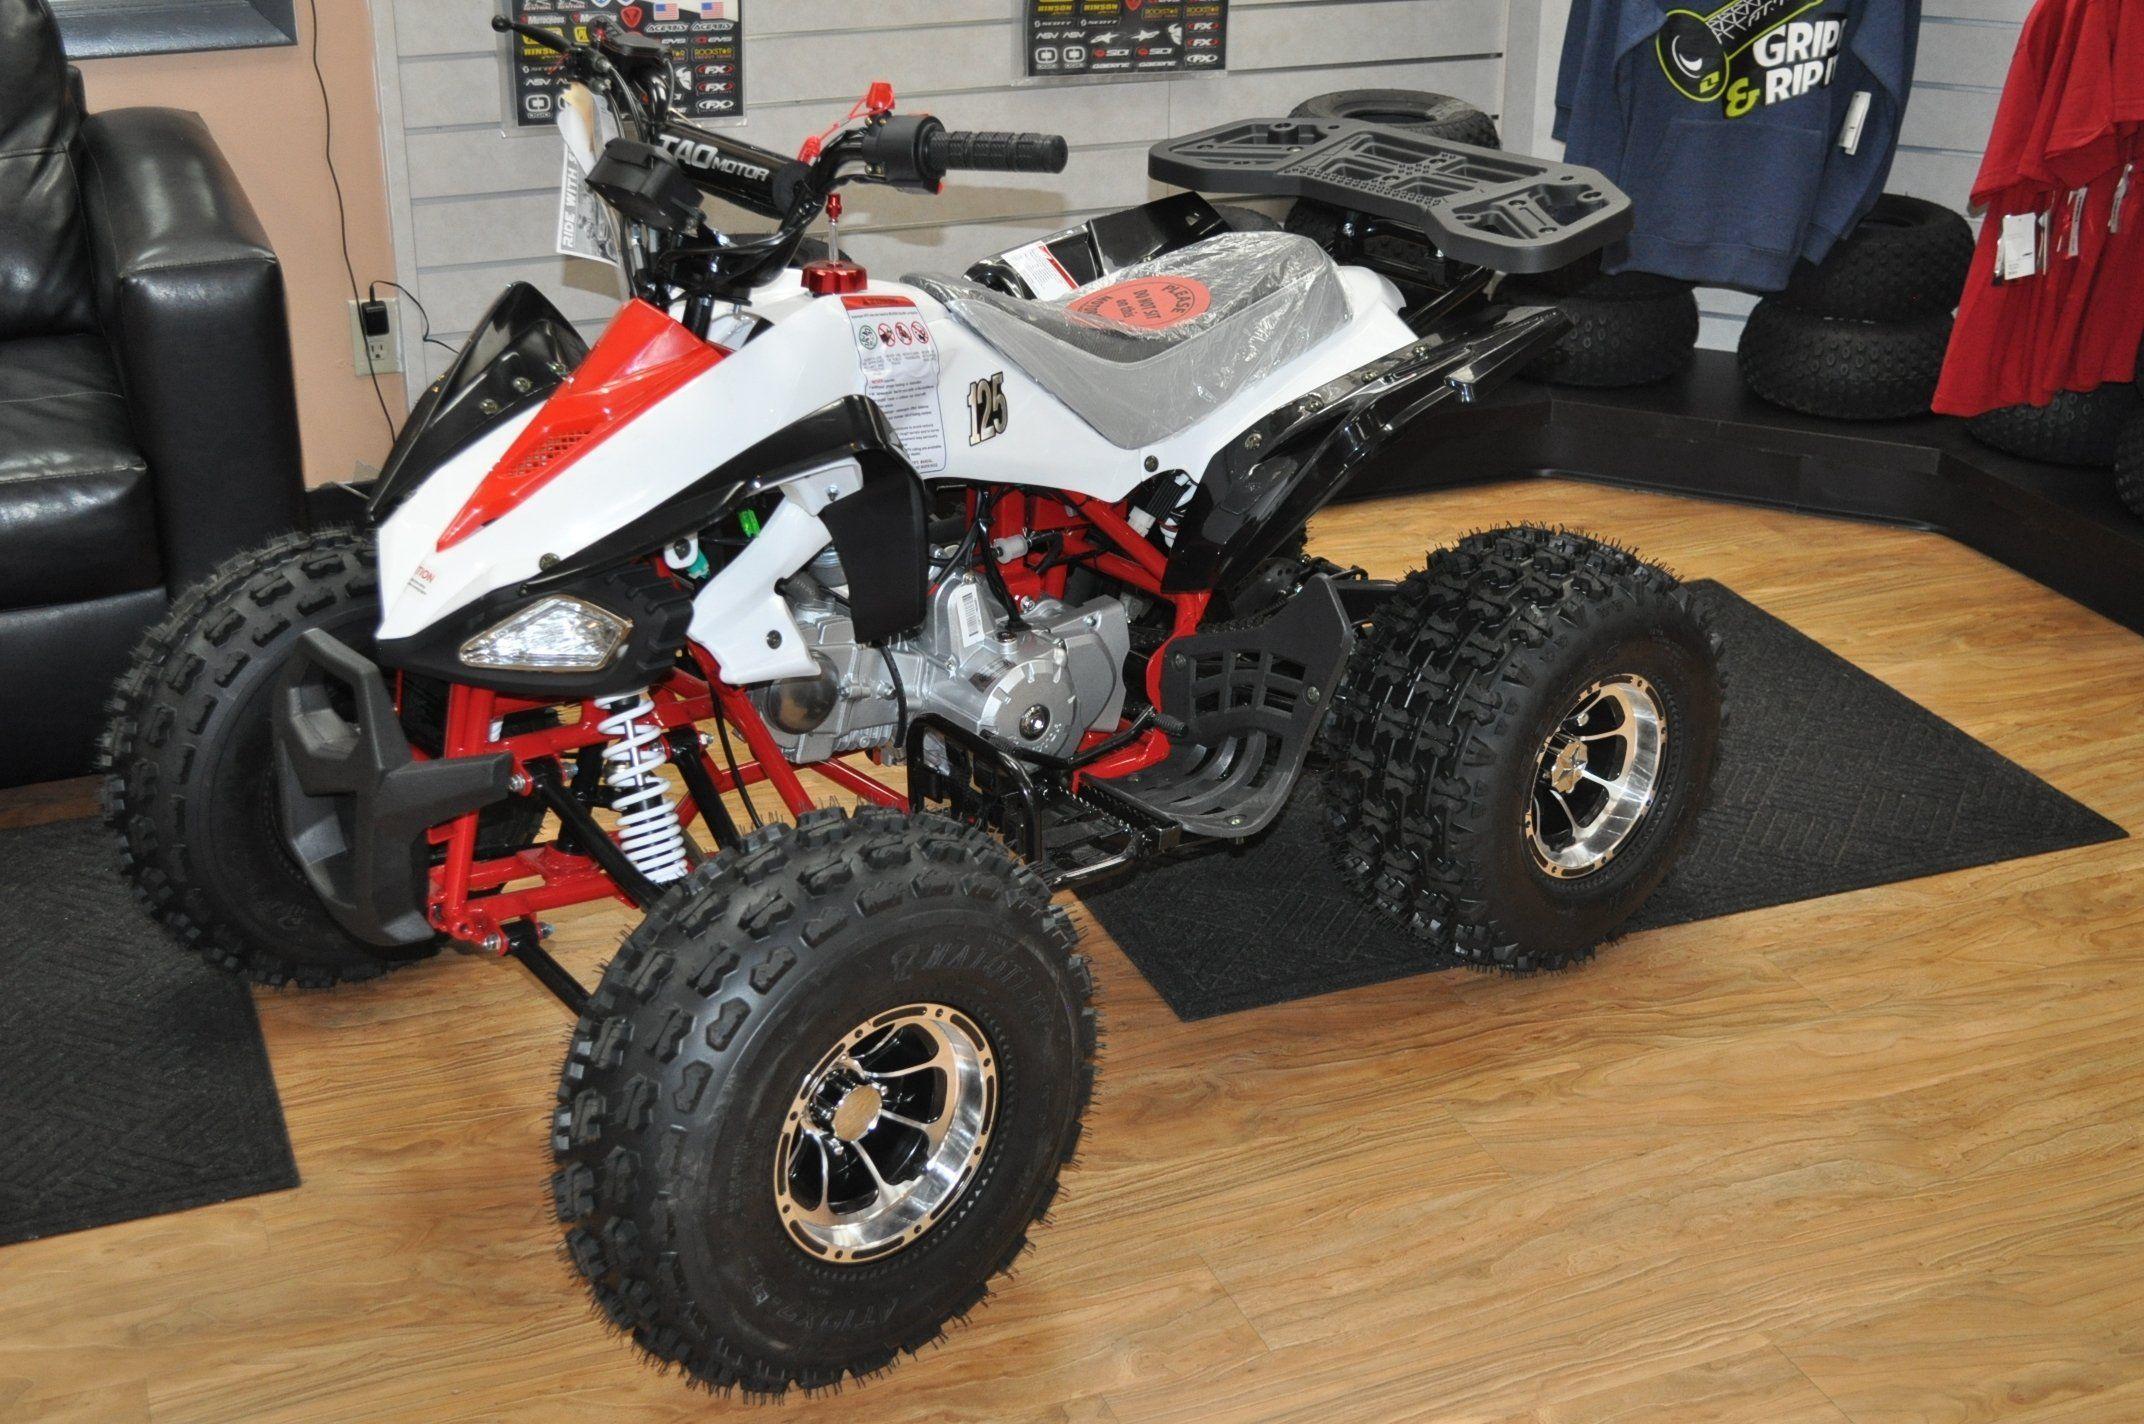 2019 Premium Nitro 125cc Gas Powered Youth ATV | Products